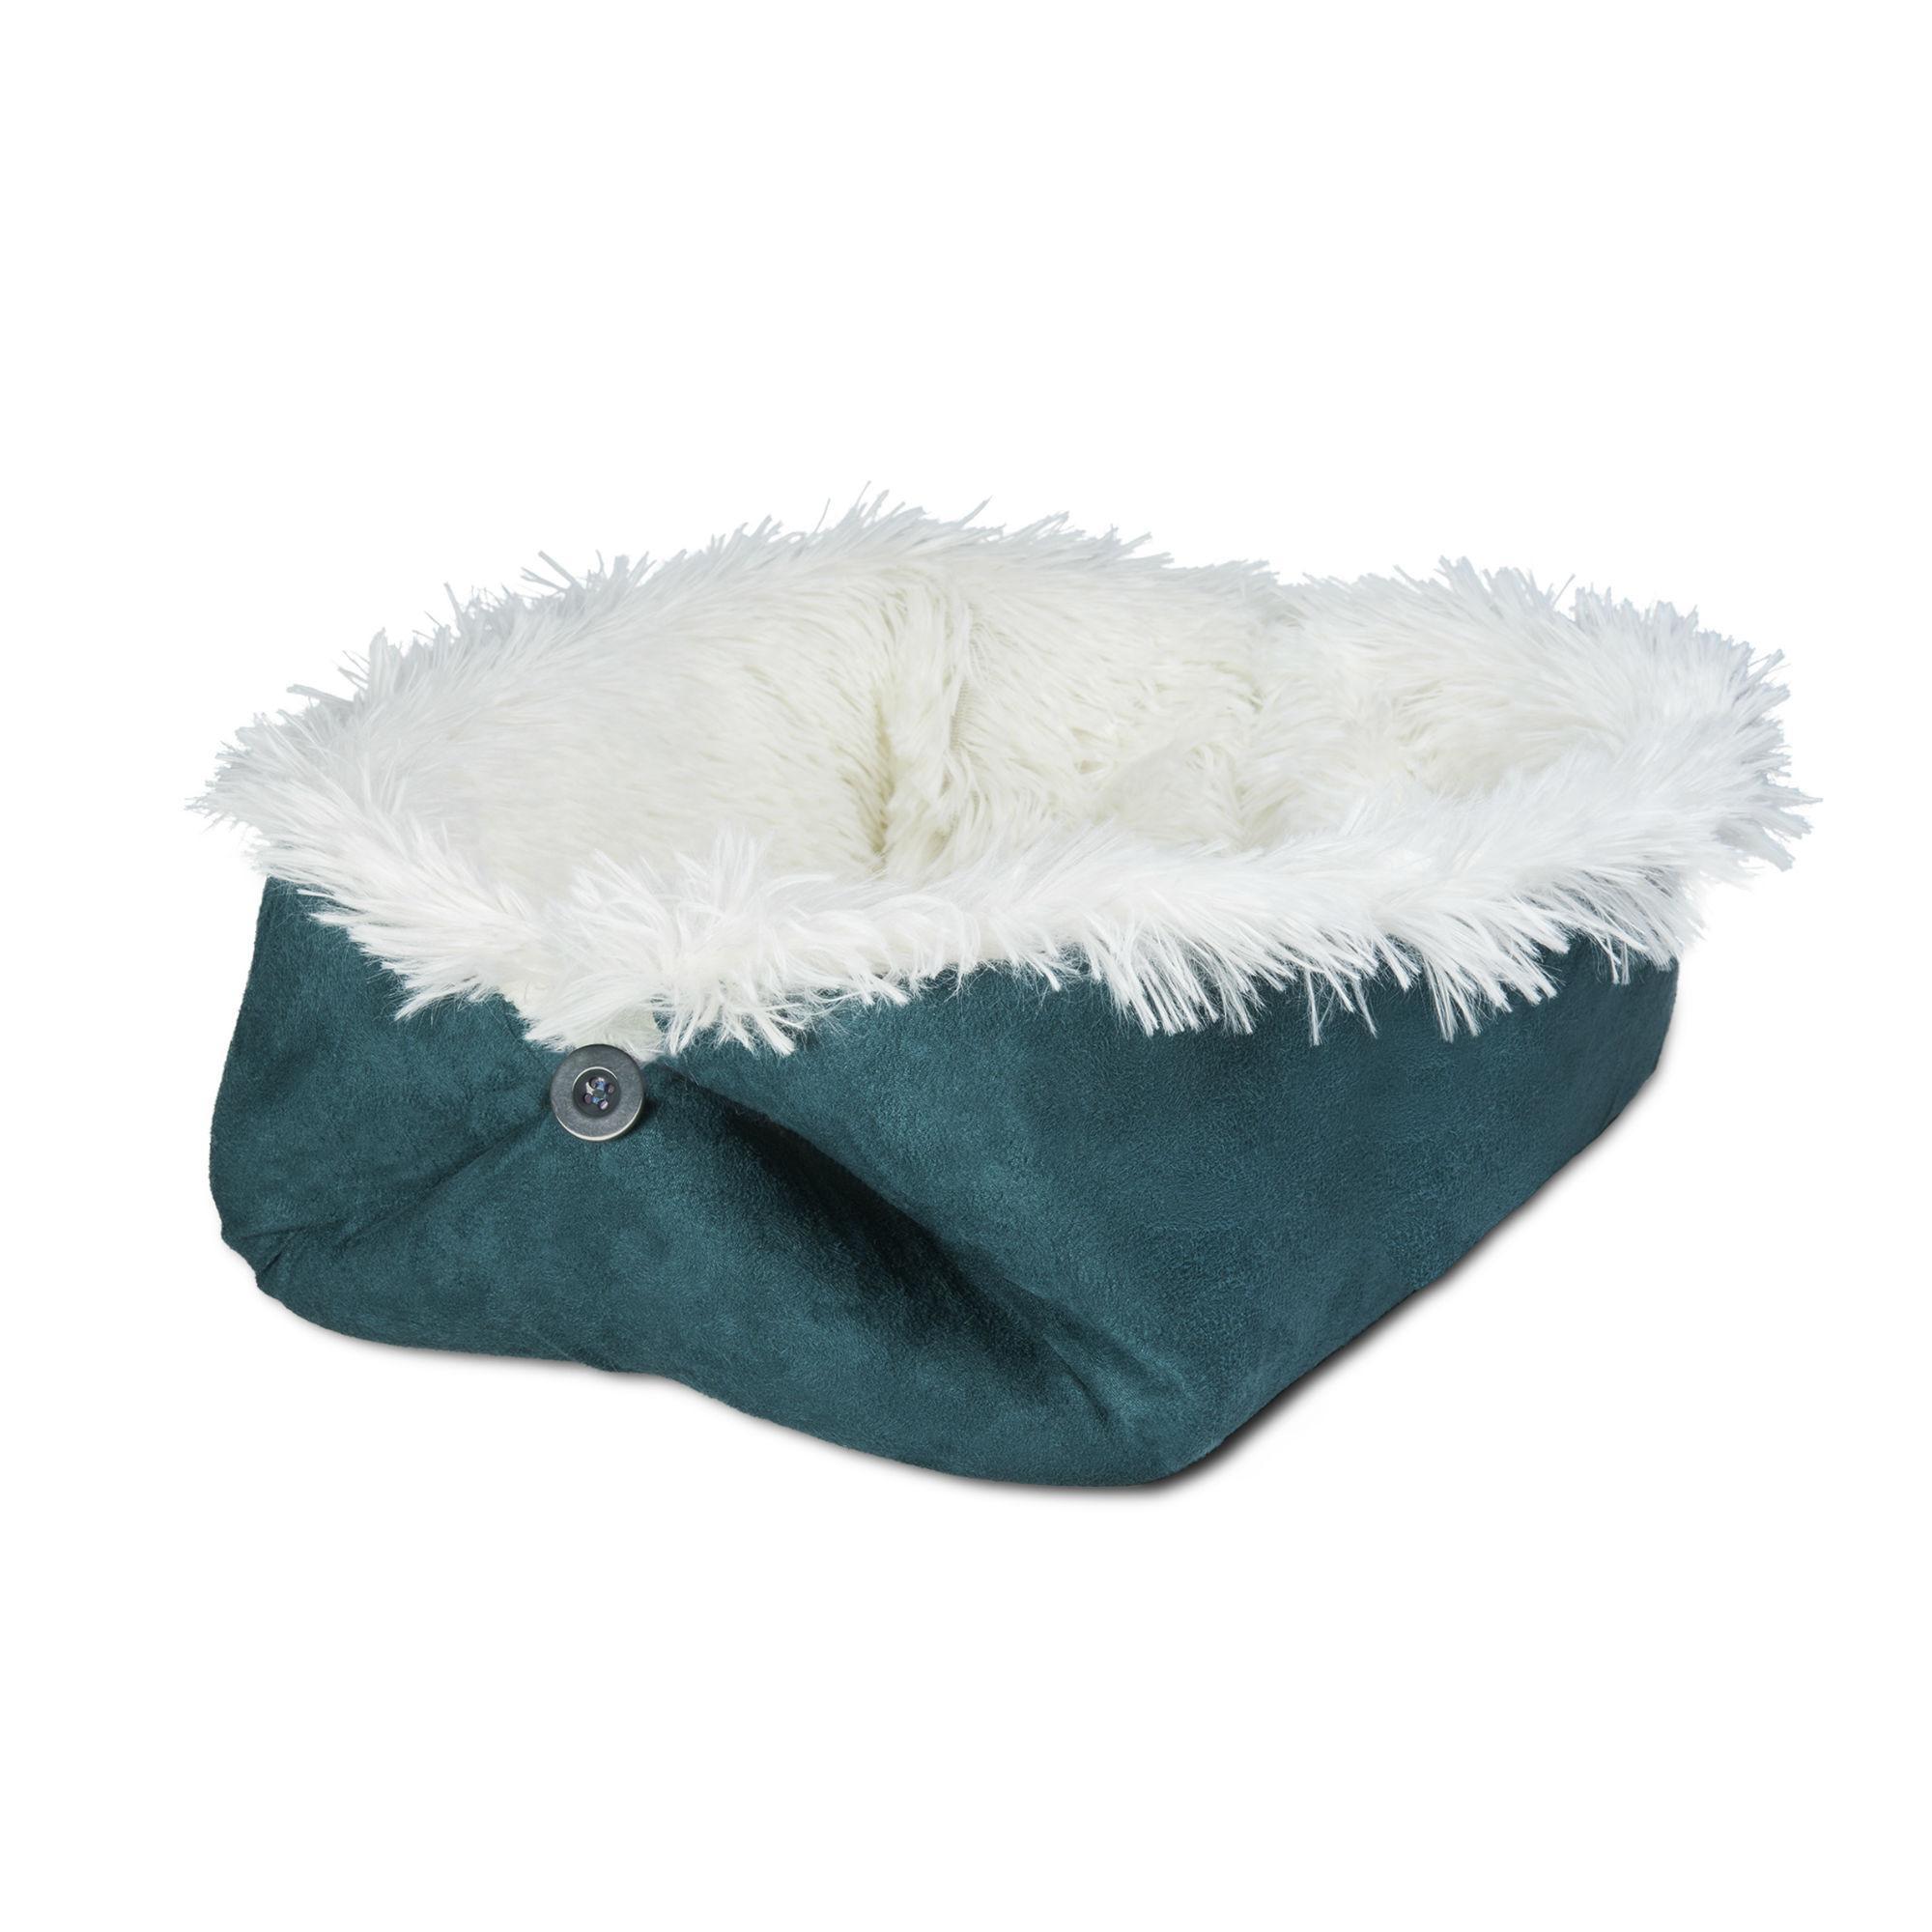 FurHaven Self-Warming Convertible Cuddle Pet Bed & Mat - Spruce